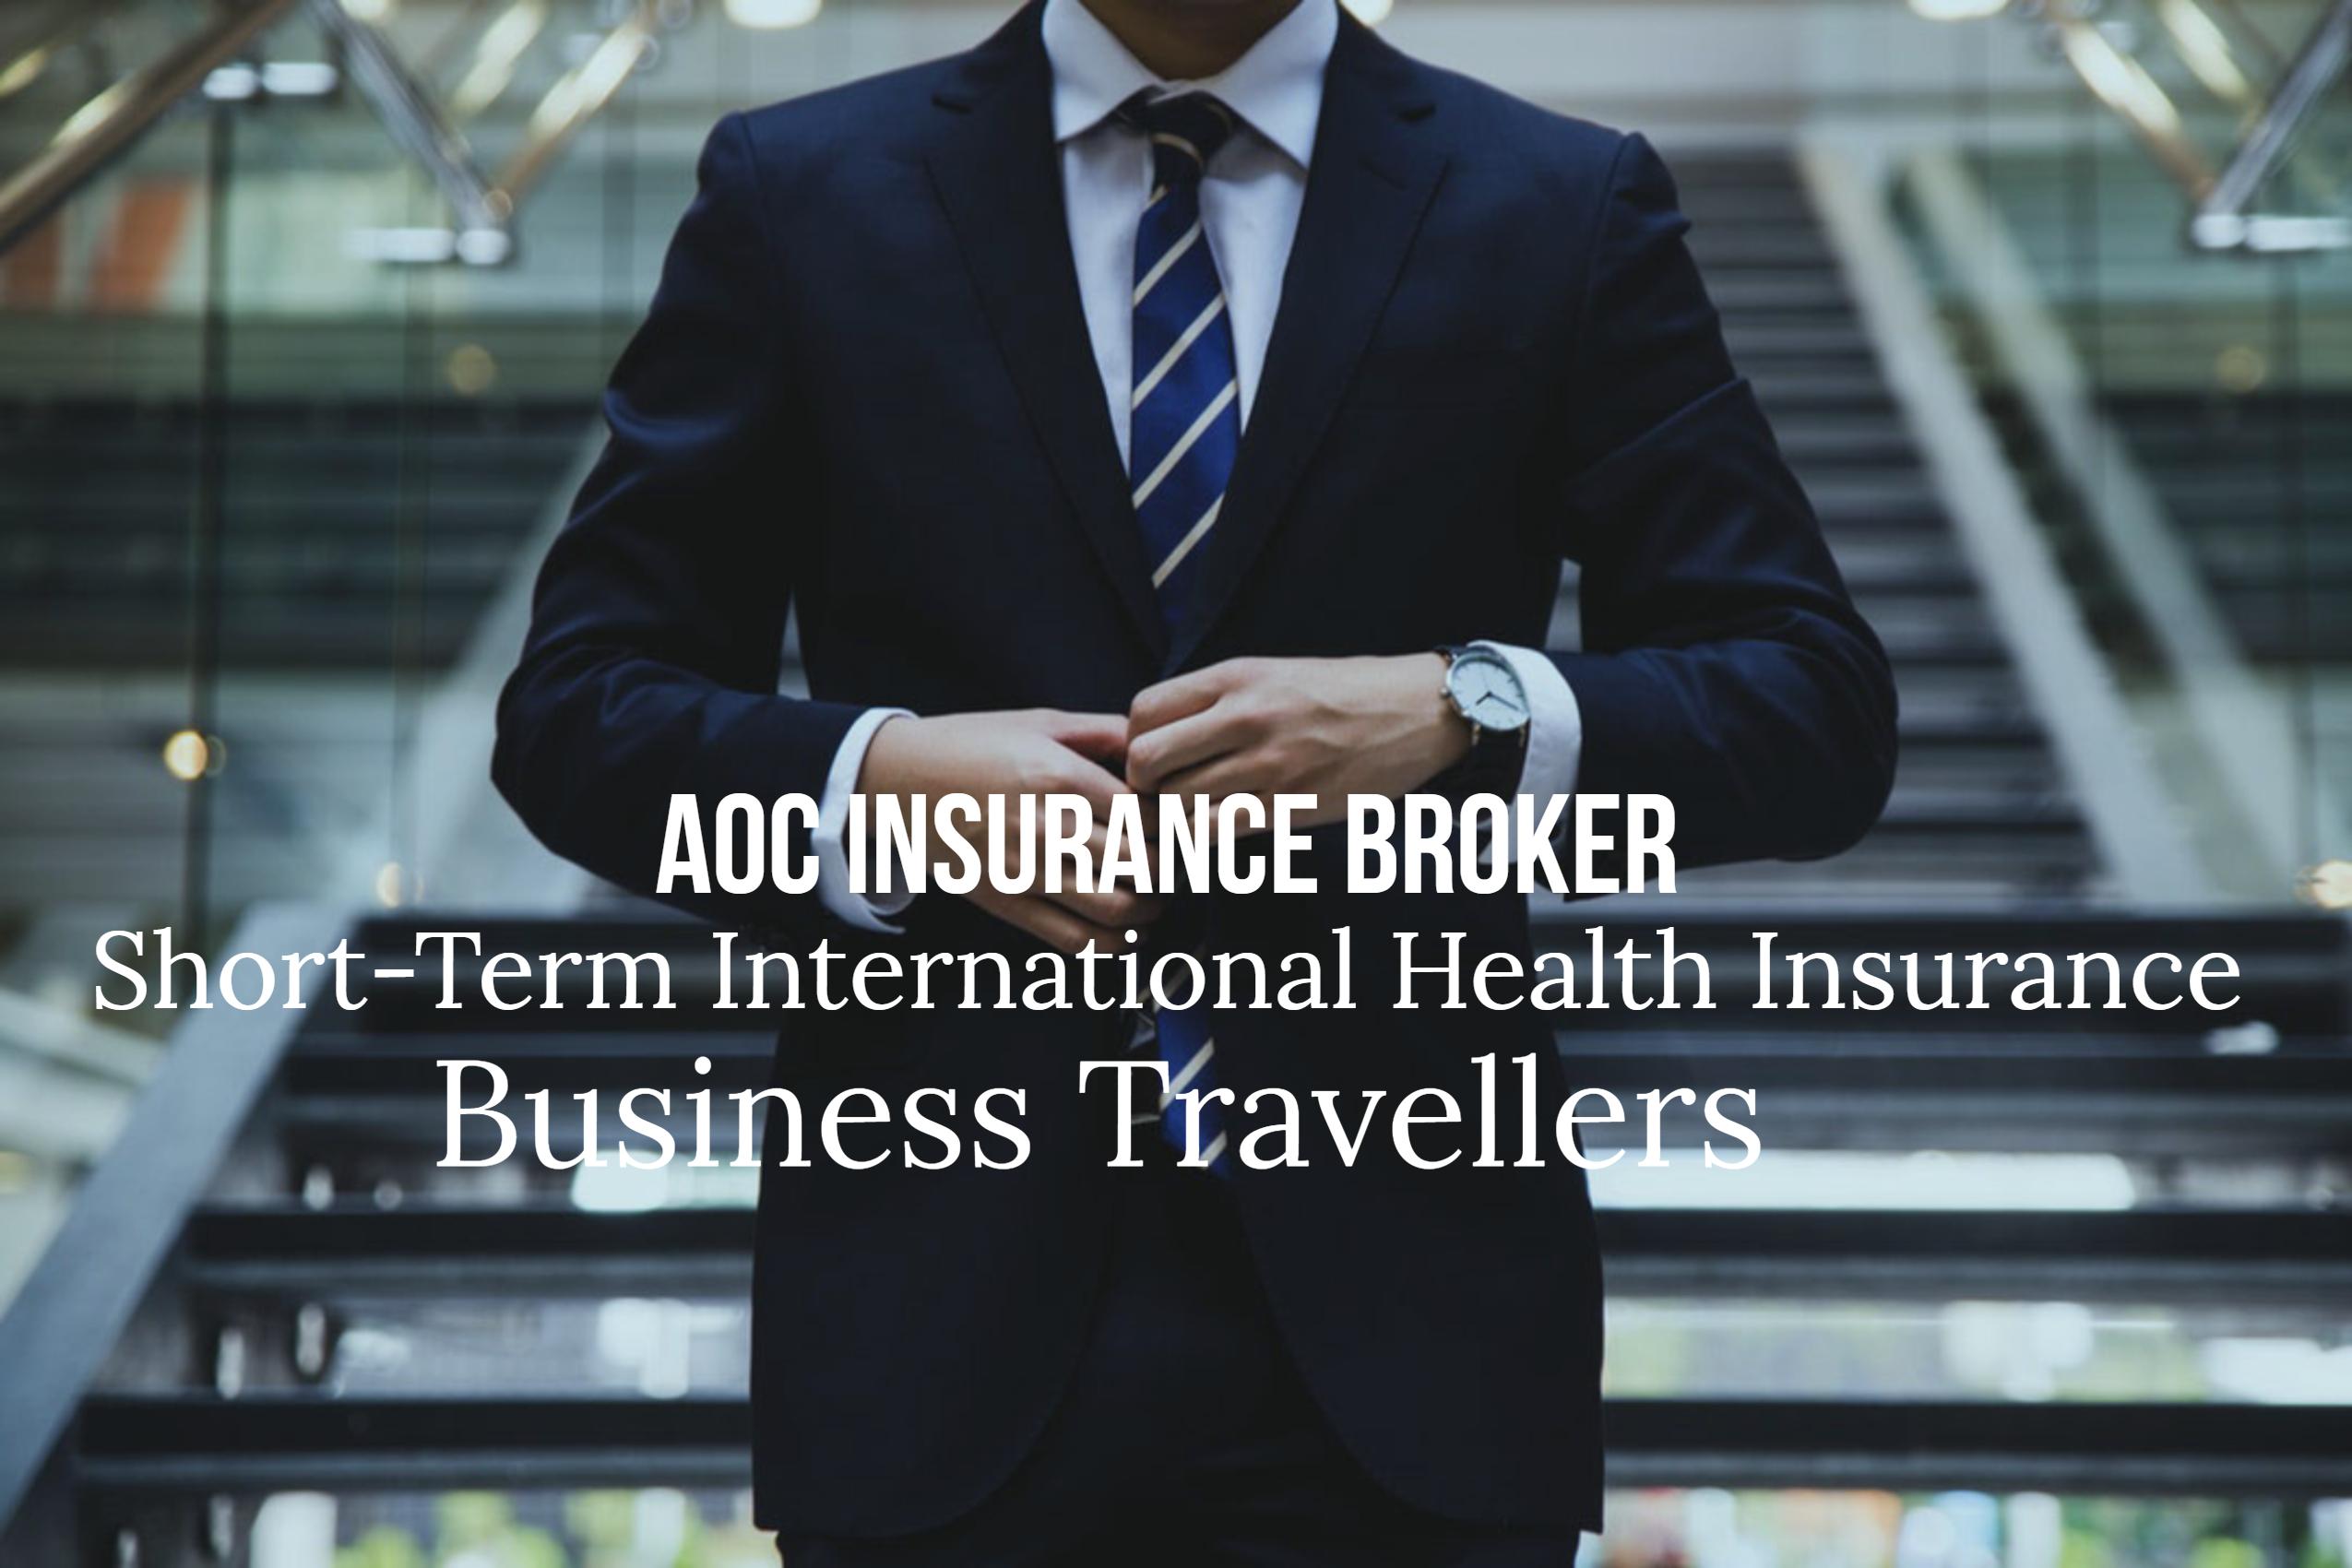 Short term travel health insurance | AOC Insurance Broker